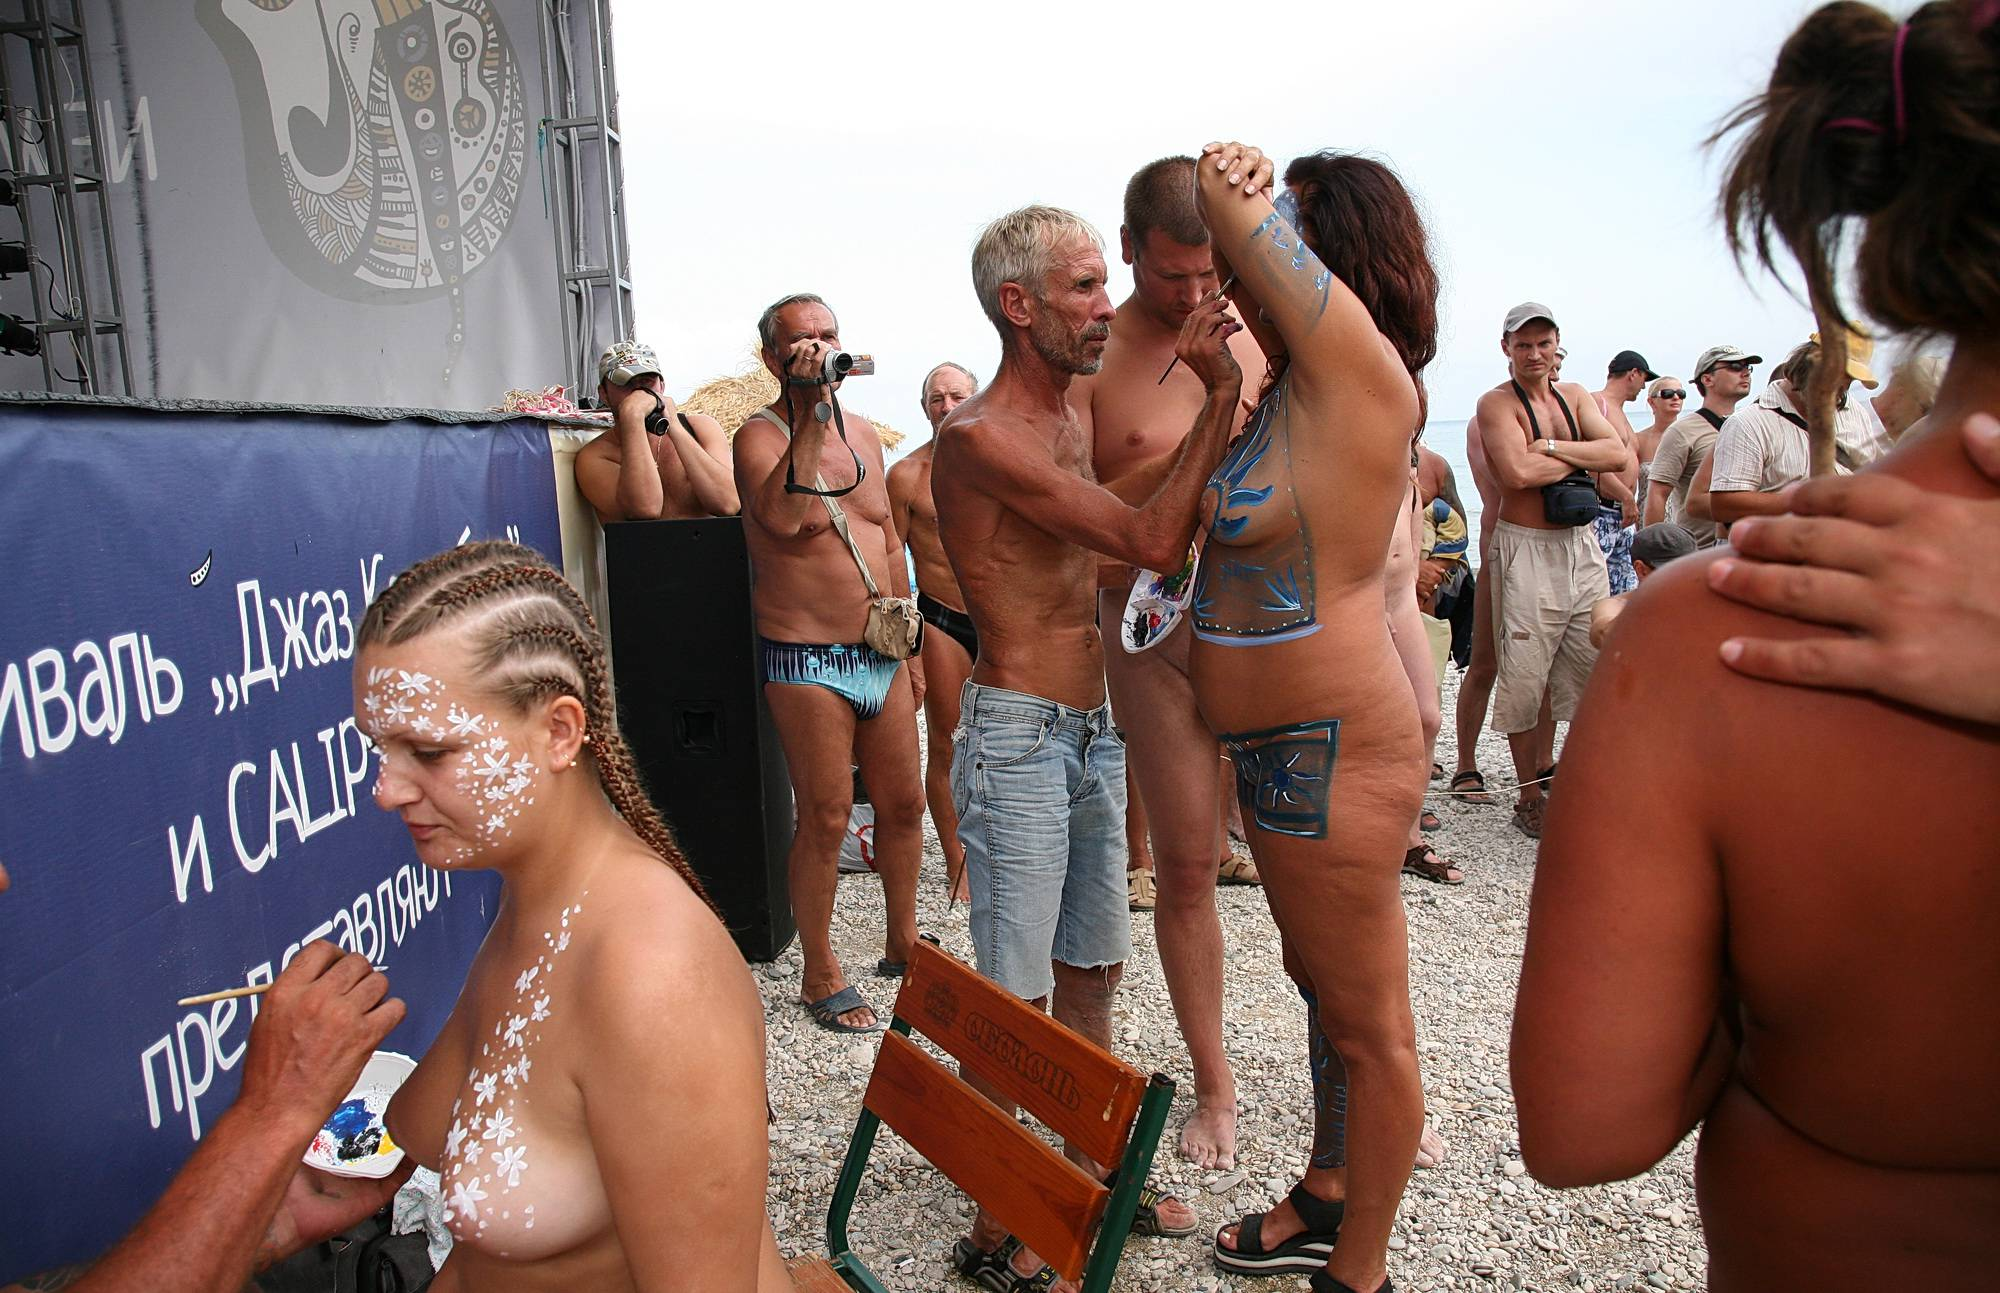 Nudist Pictures Running Around On Sand - 1